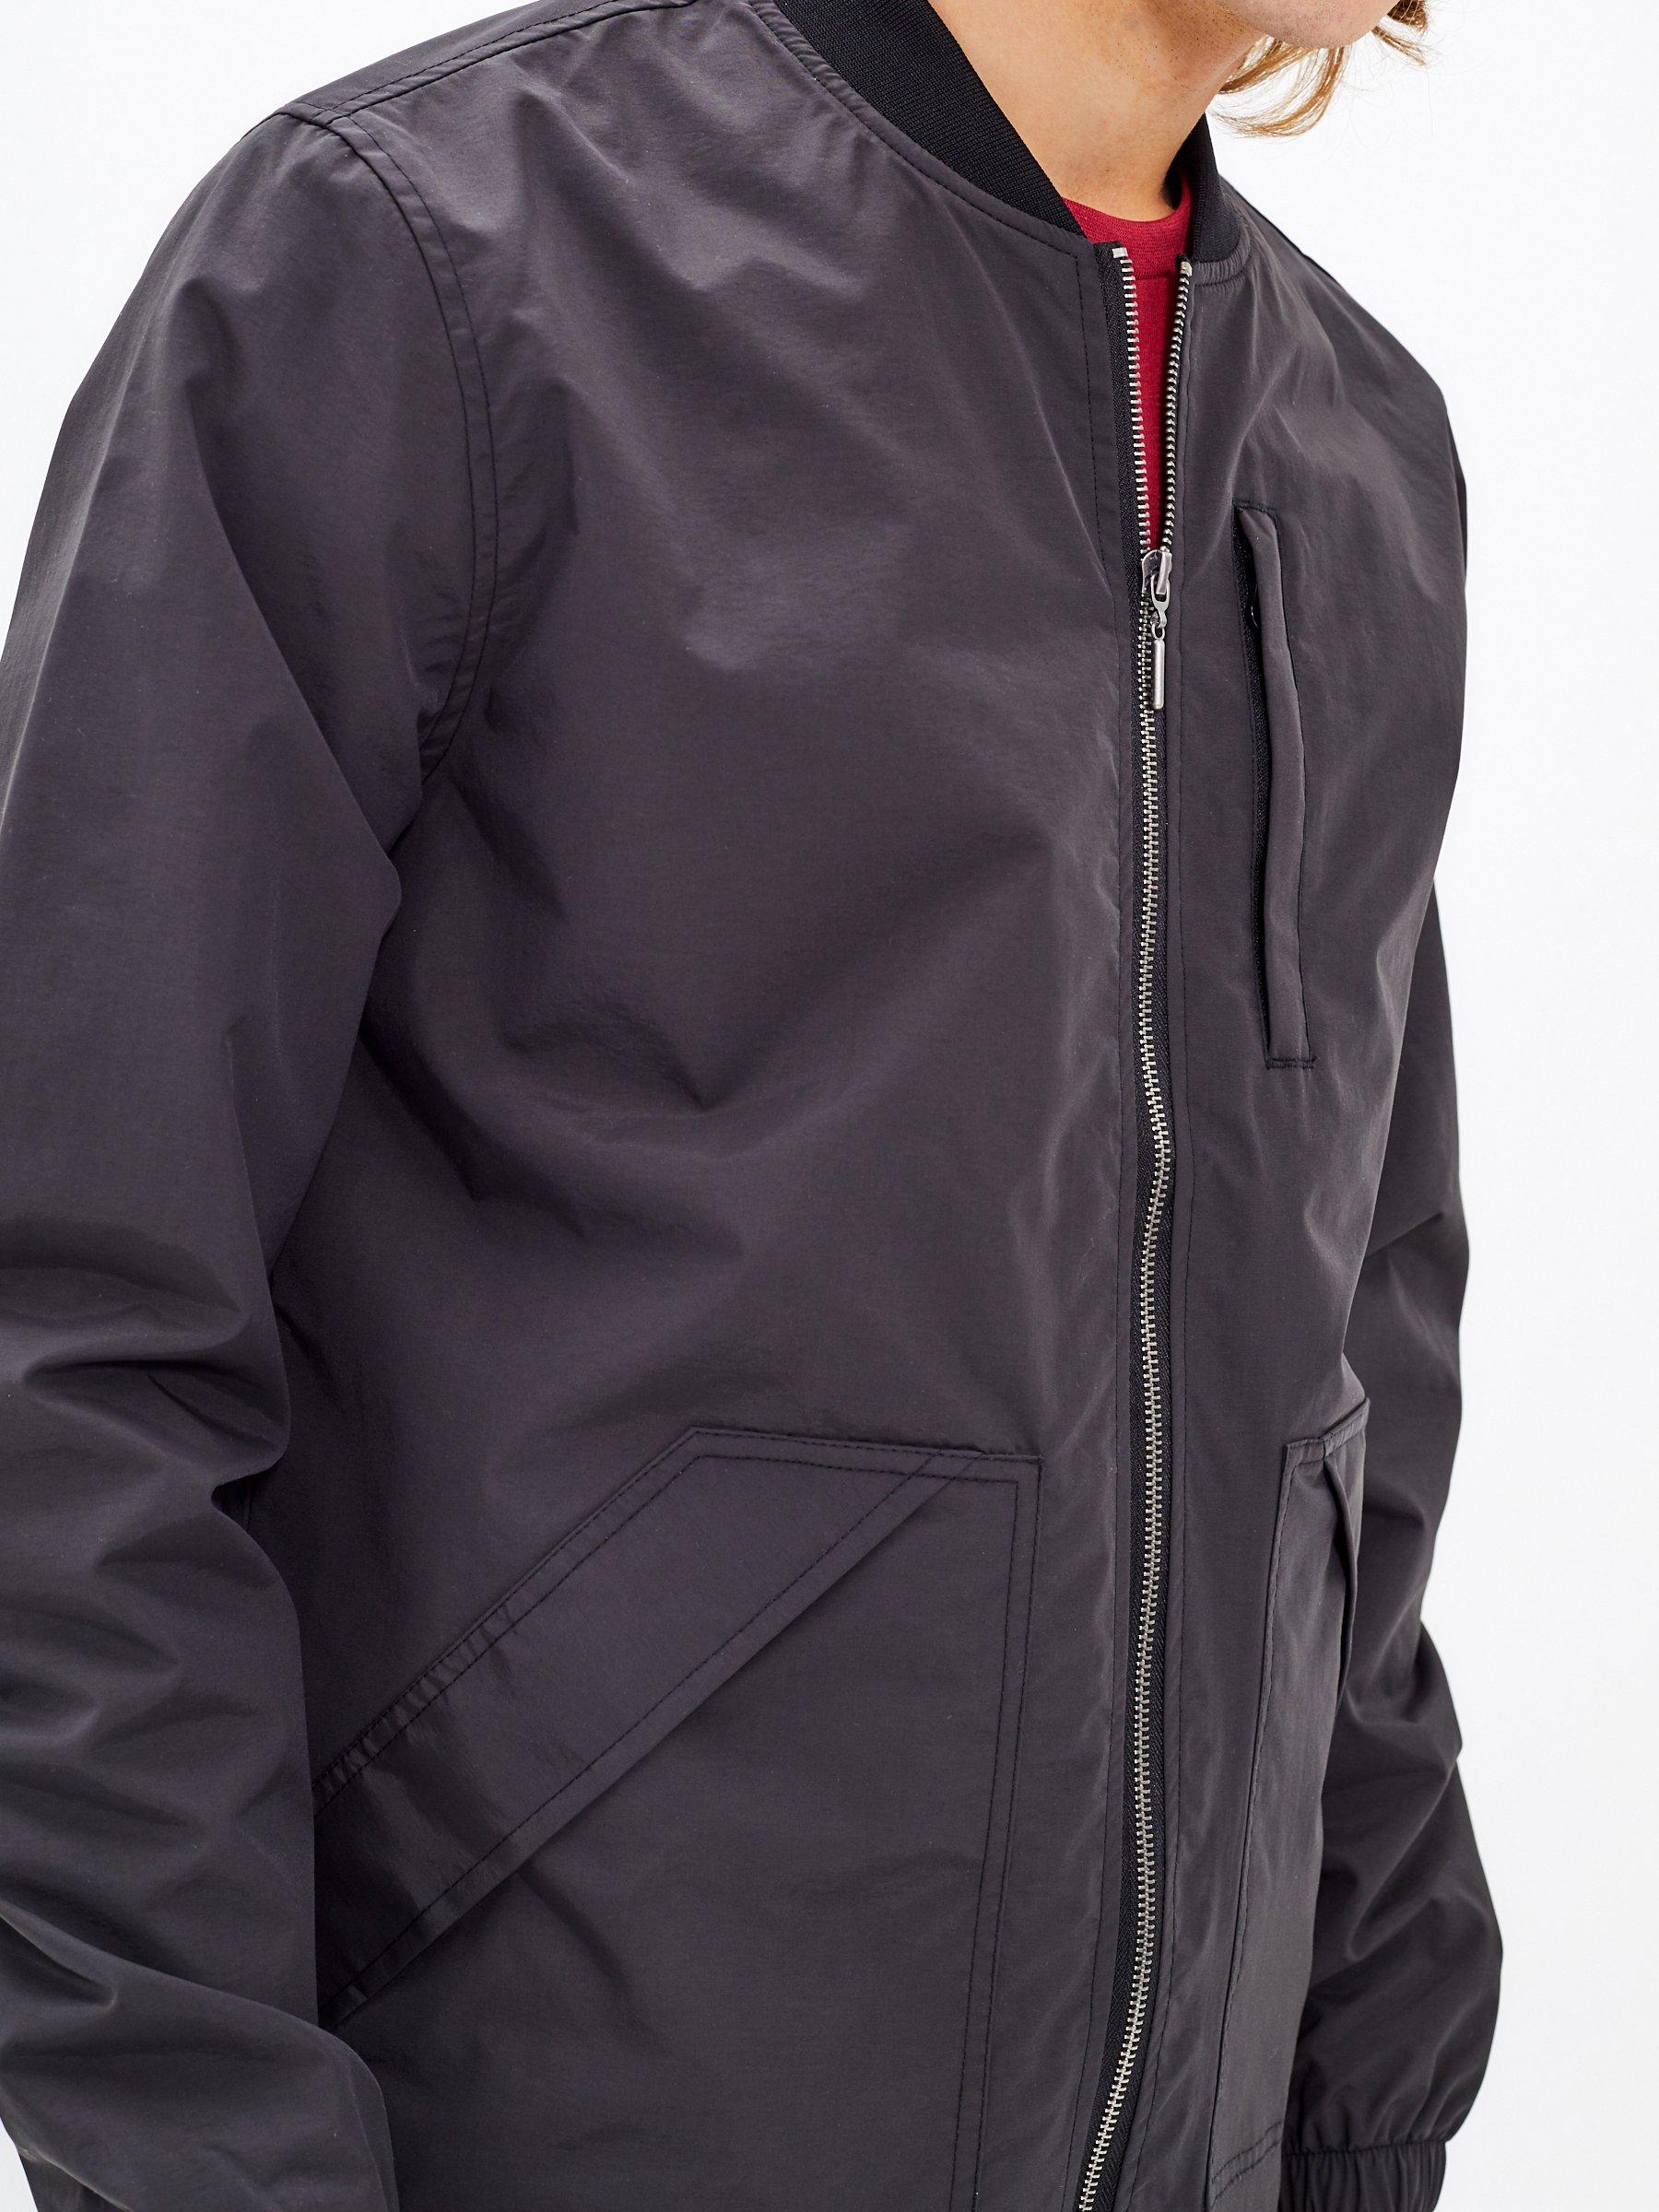 Kabát pea s vysokým žebrovaným límcem. 1 398 Kč. → · Bunda bomber. Bunda  bomber 002460bd450